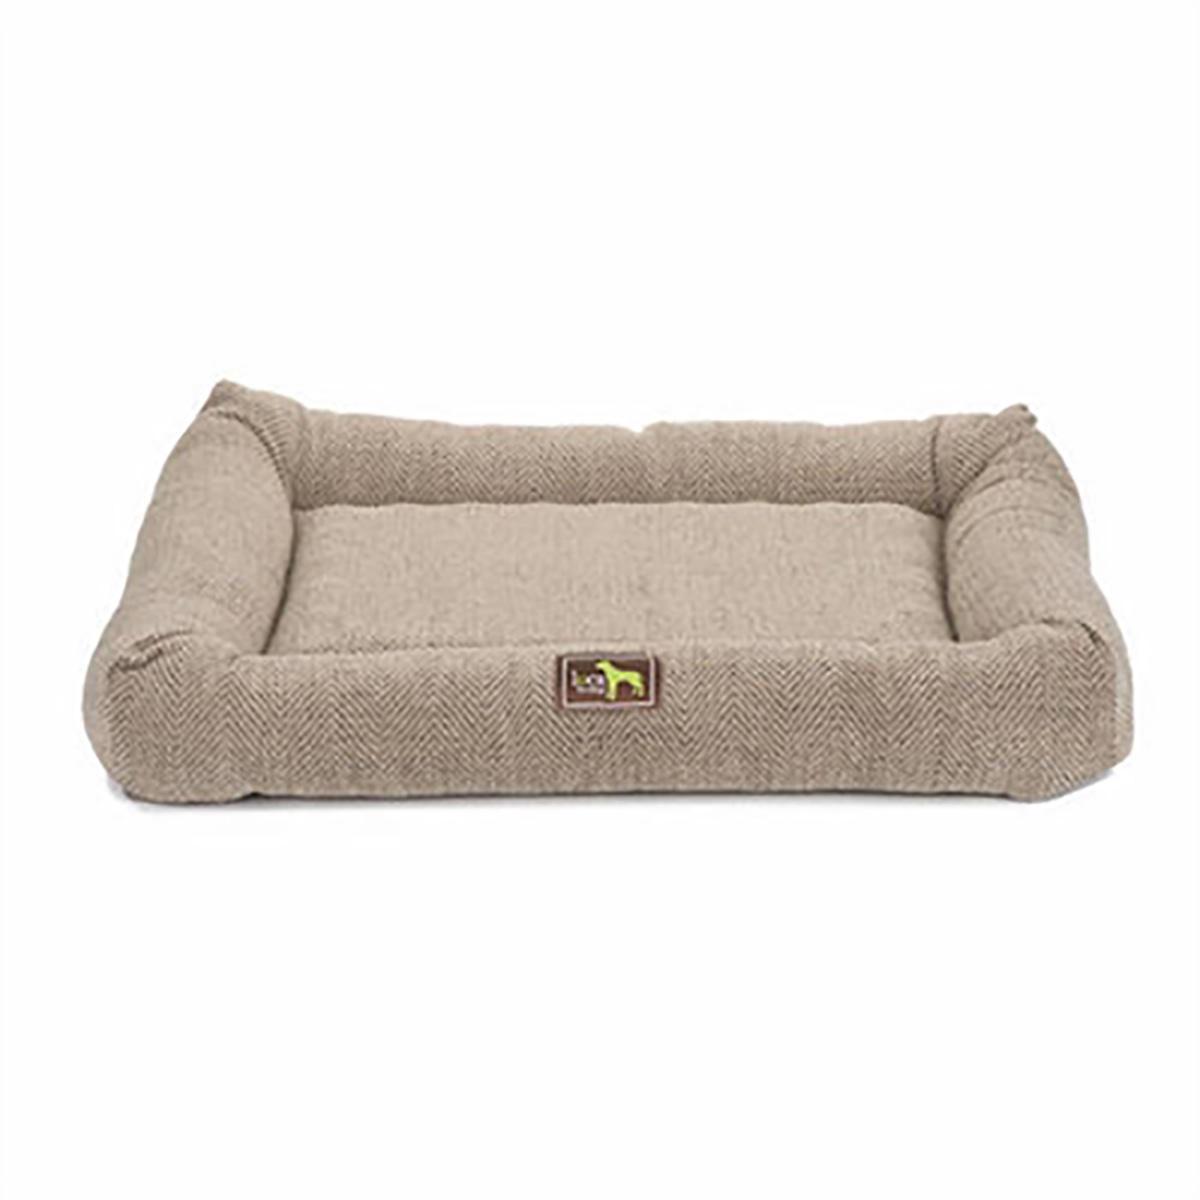 Luca Crate Cuddler Dog Bed - Cobblestone Tweed